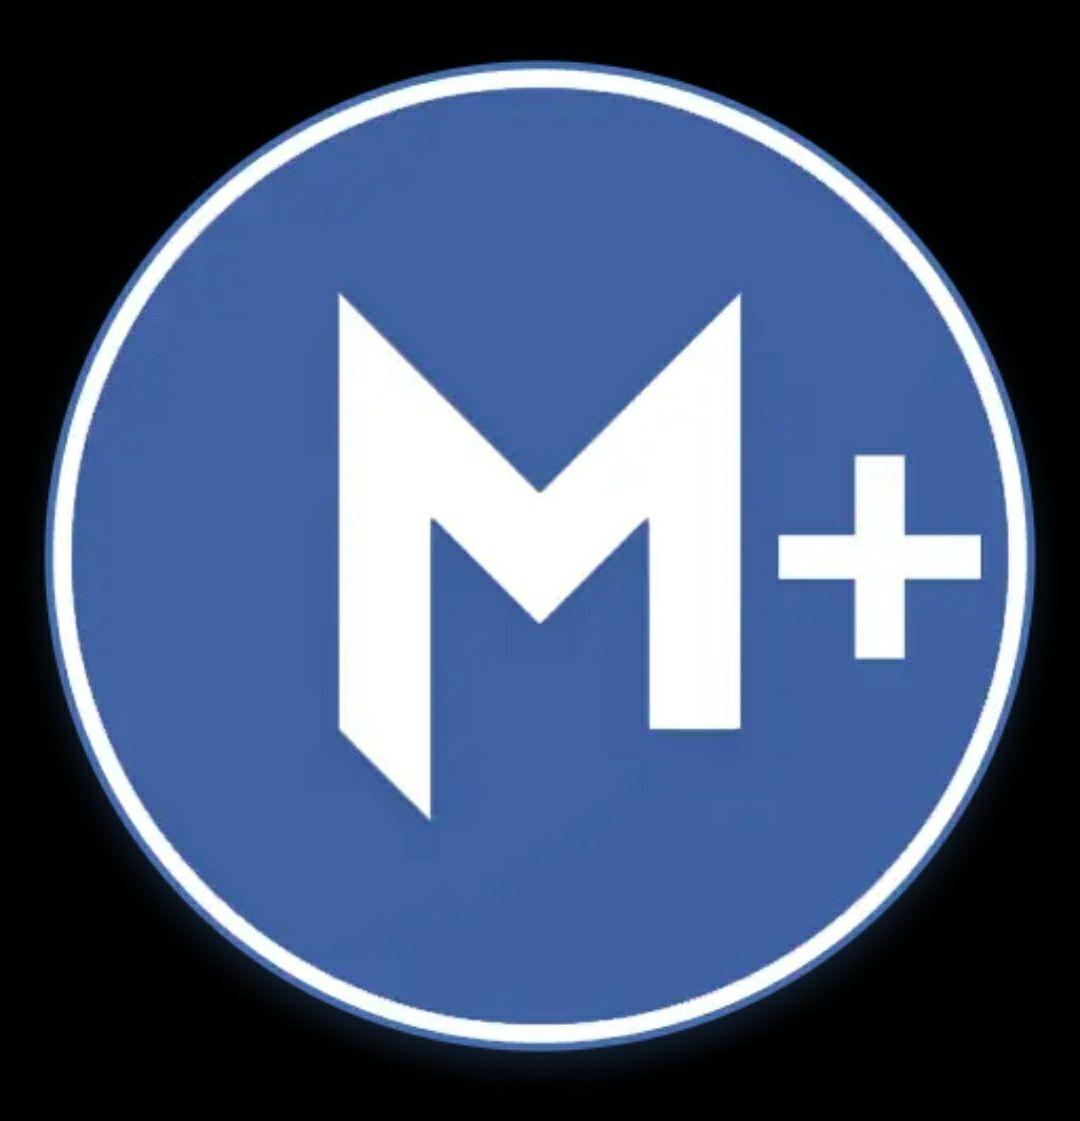 Maki Plus + Messenger - Brak reklam, Tryb nocny, Motywy, Inne media w jednym.